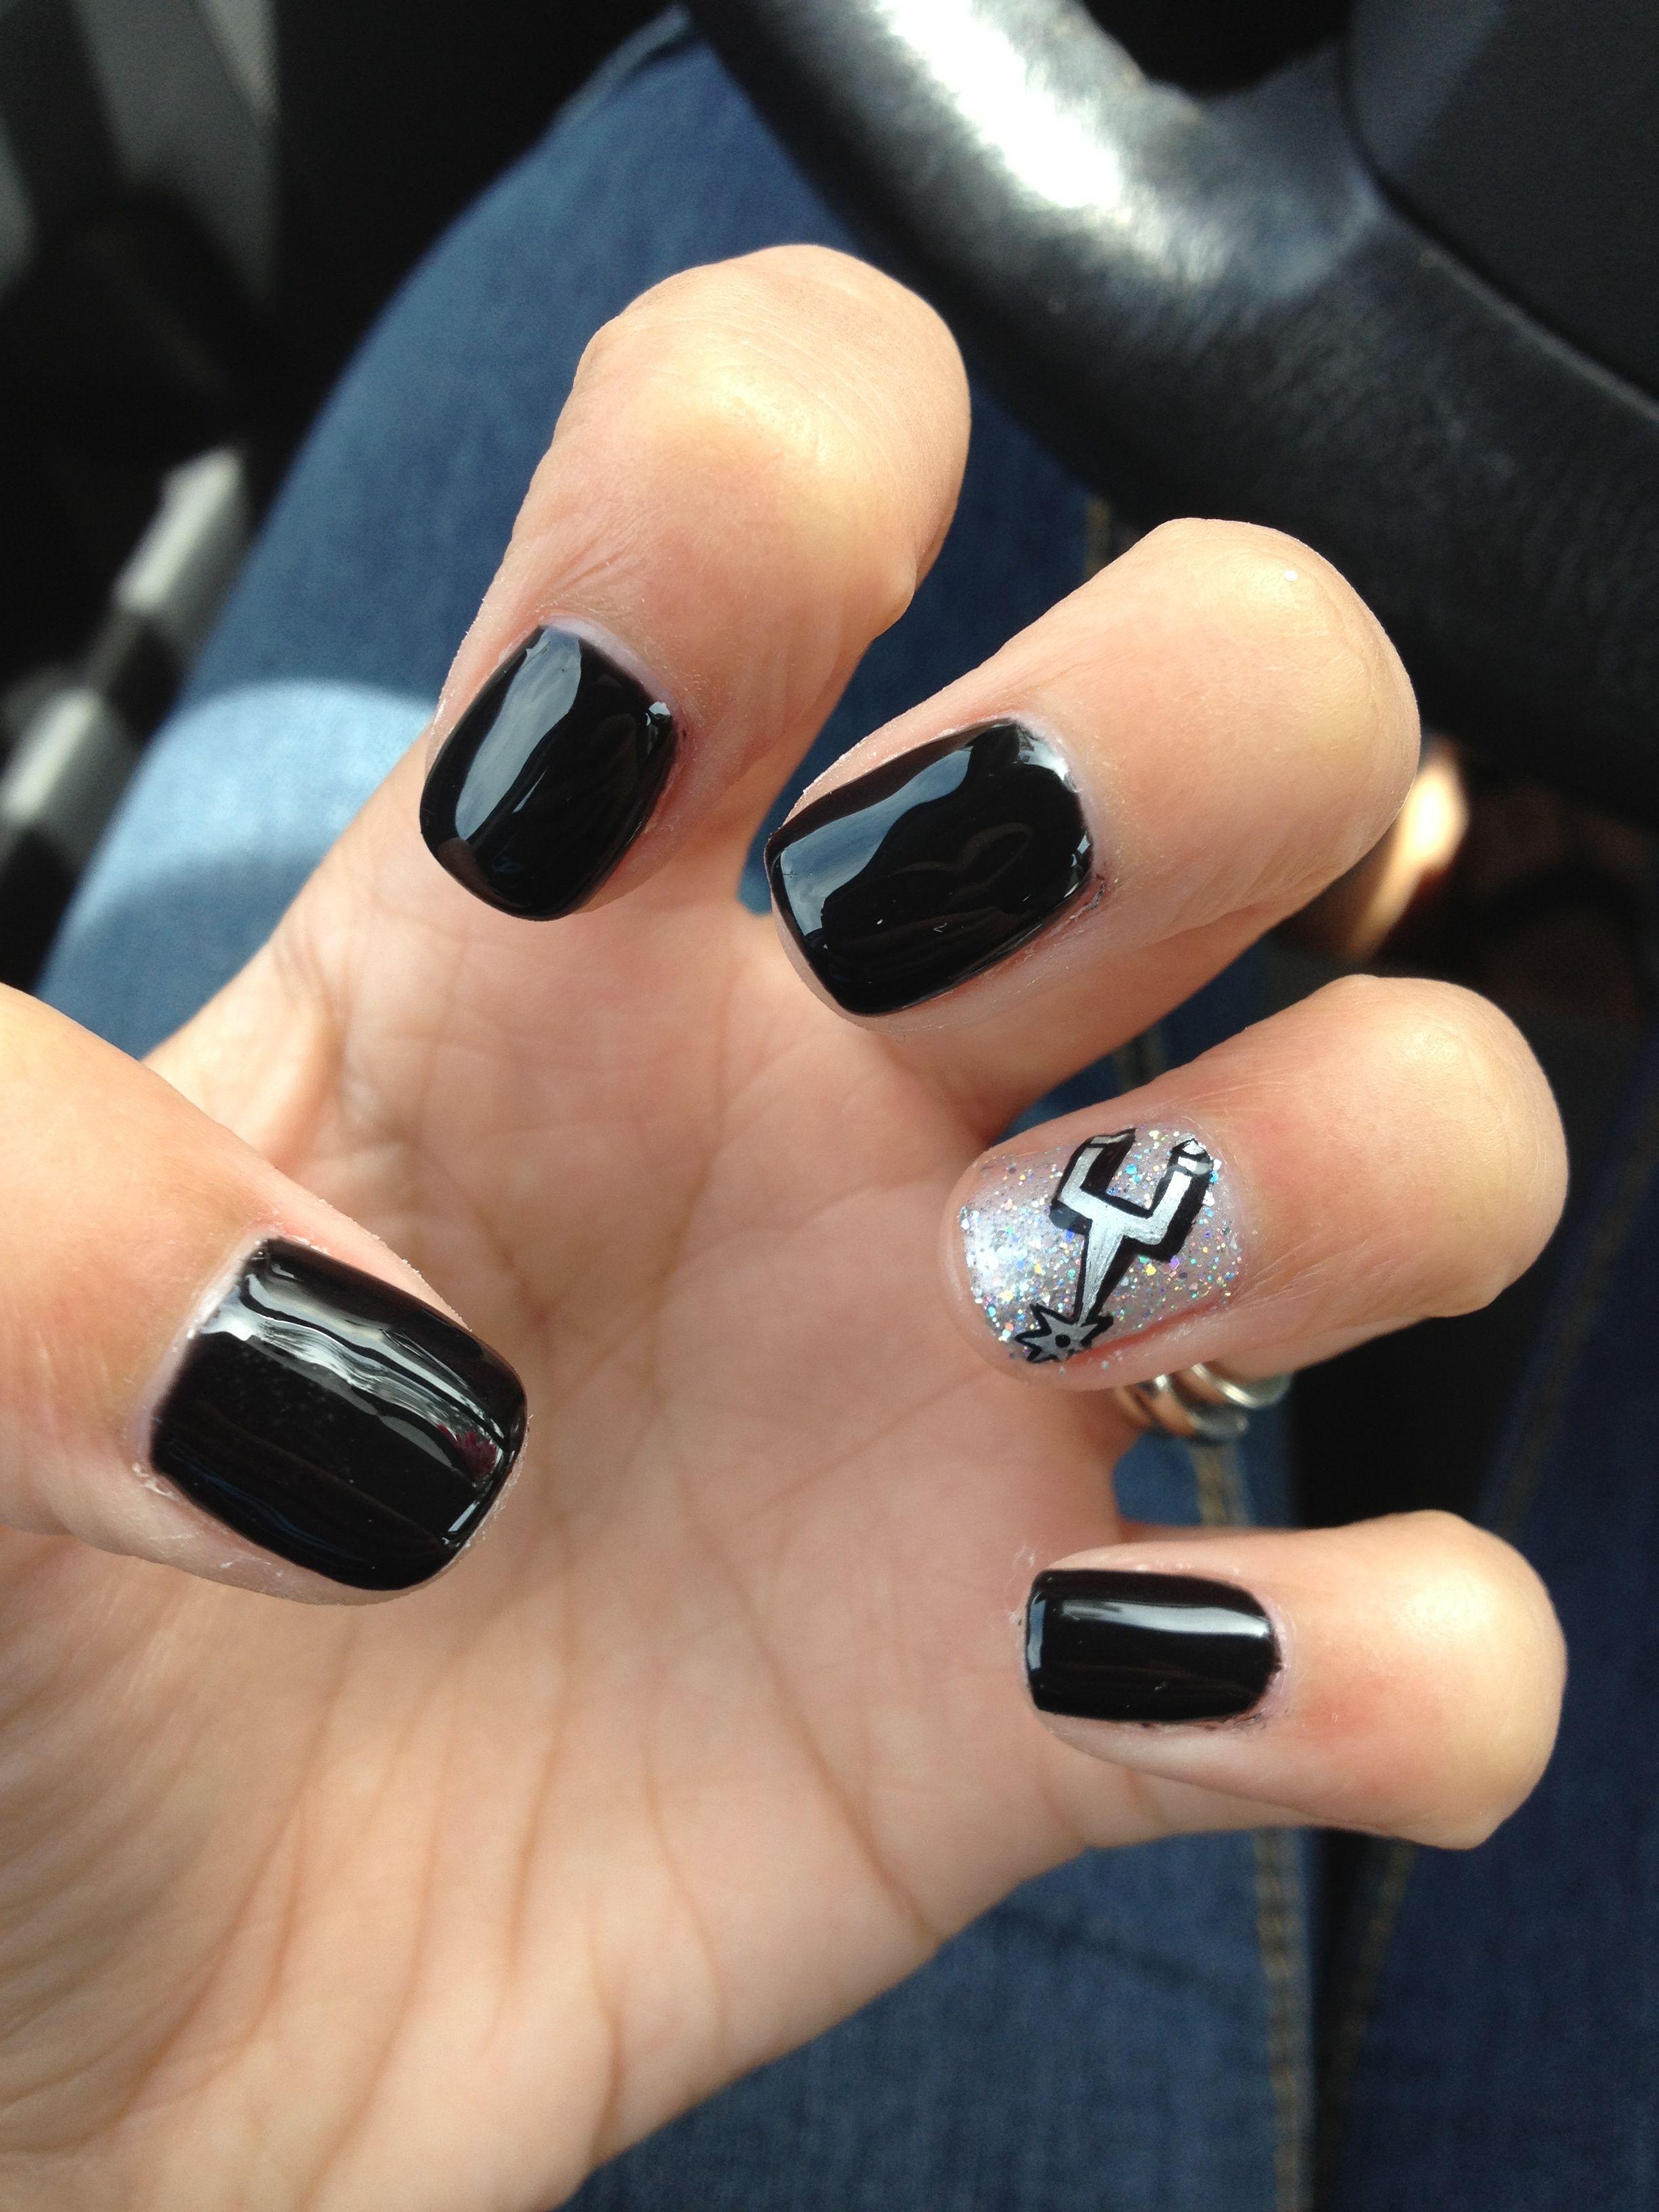 San Antonio Spurs Nails :) Go Spurs Go!! Black & Silver!! Done by ...